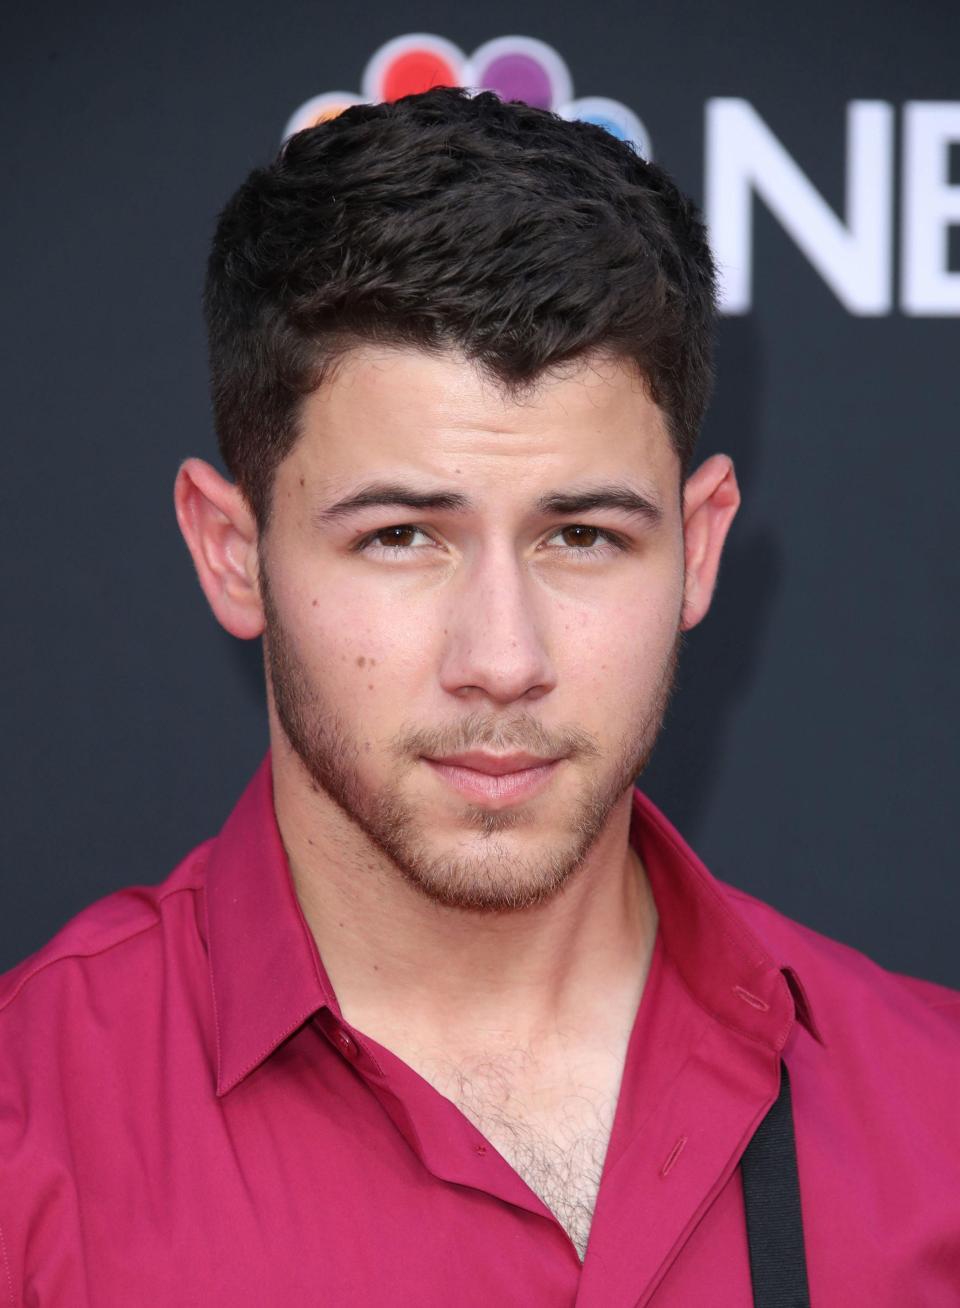 Joe Jonas   Known people - famous people news and biographies